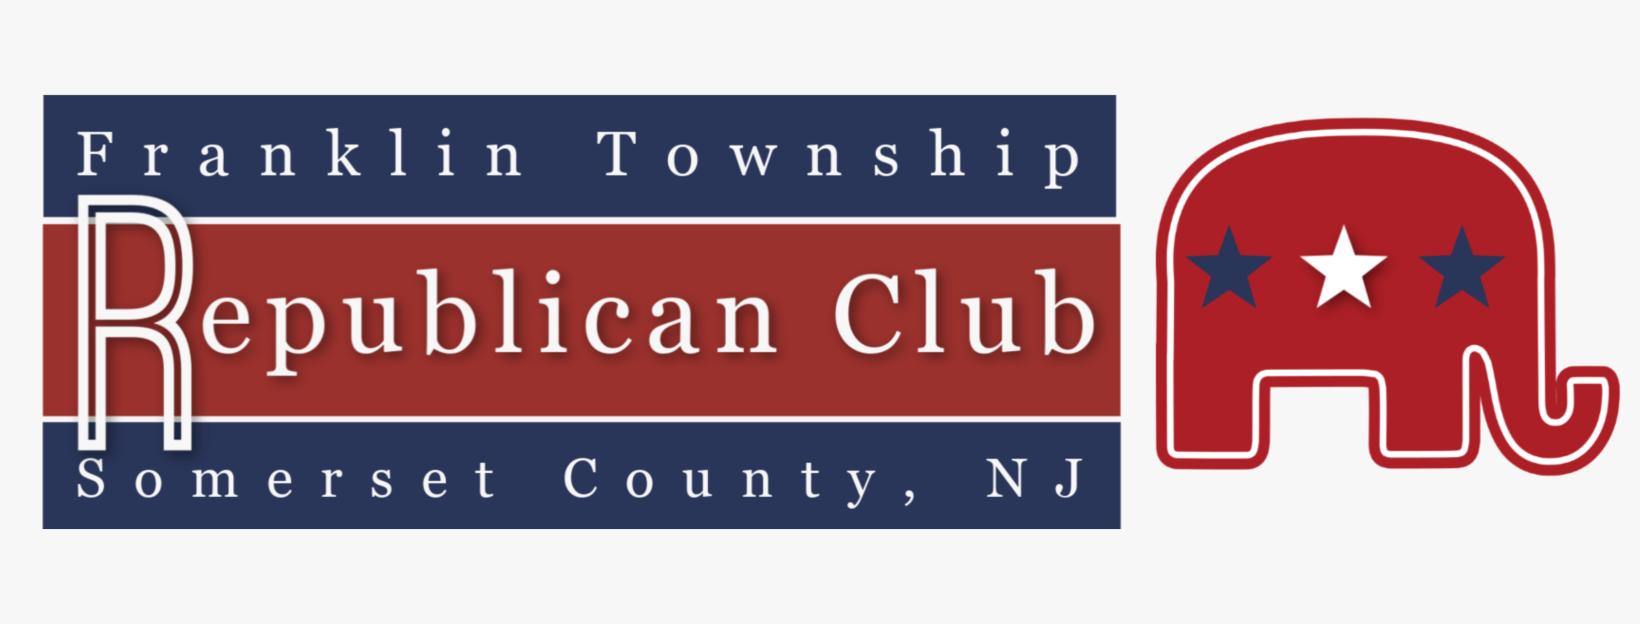 Franklin Township Republican Club